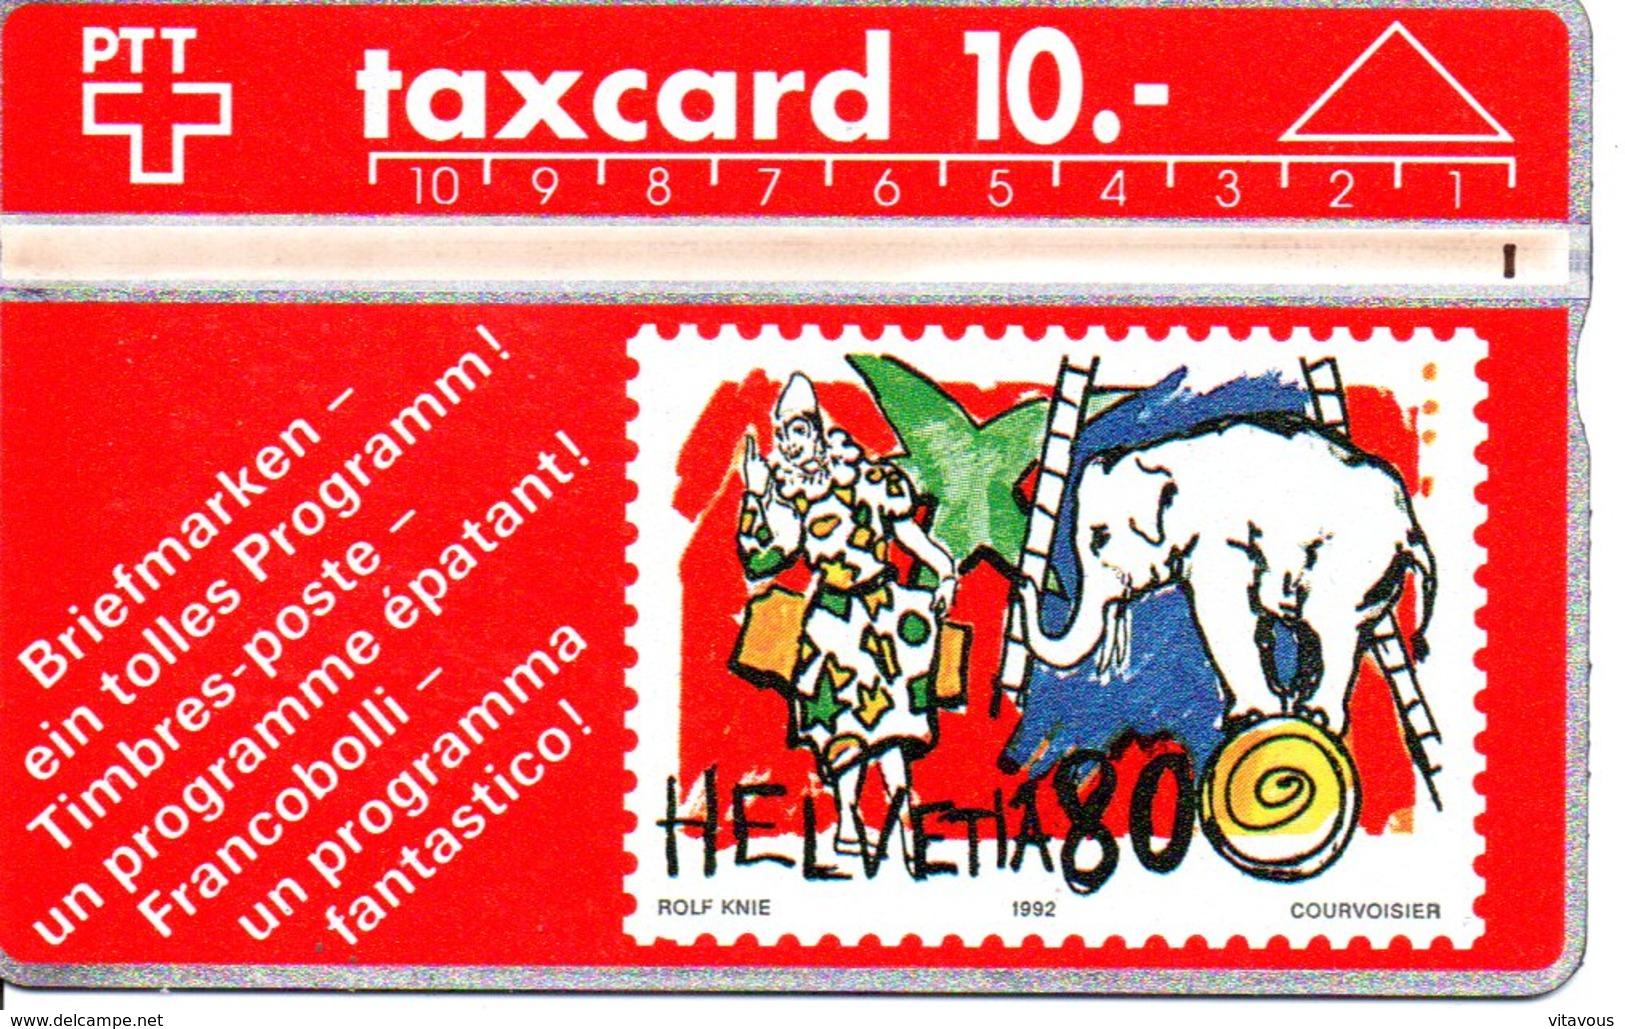 Stamp Timbre éléphant Olefant Elephant  Cirque Télécarte Suisse Taxcard Phonecard  (G 106 ) - Timbres & Monnaies